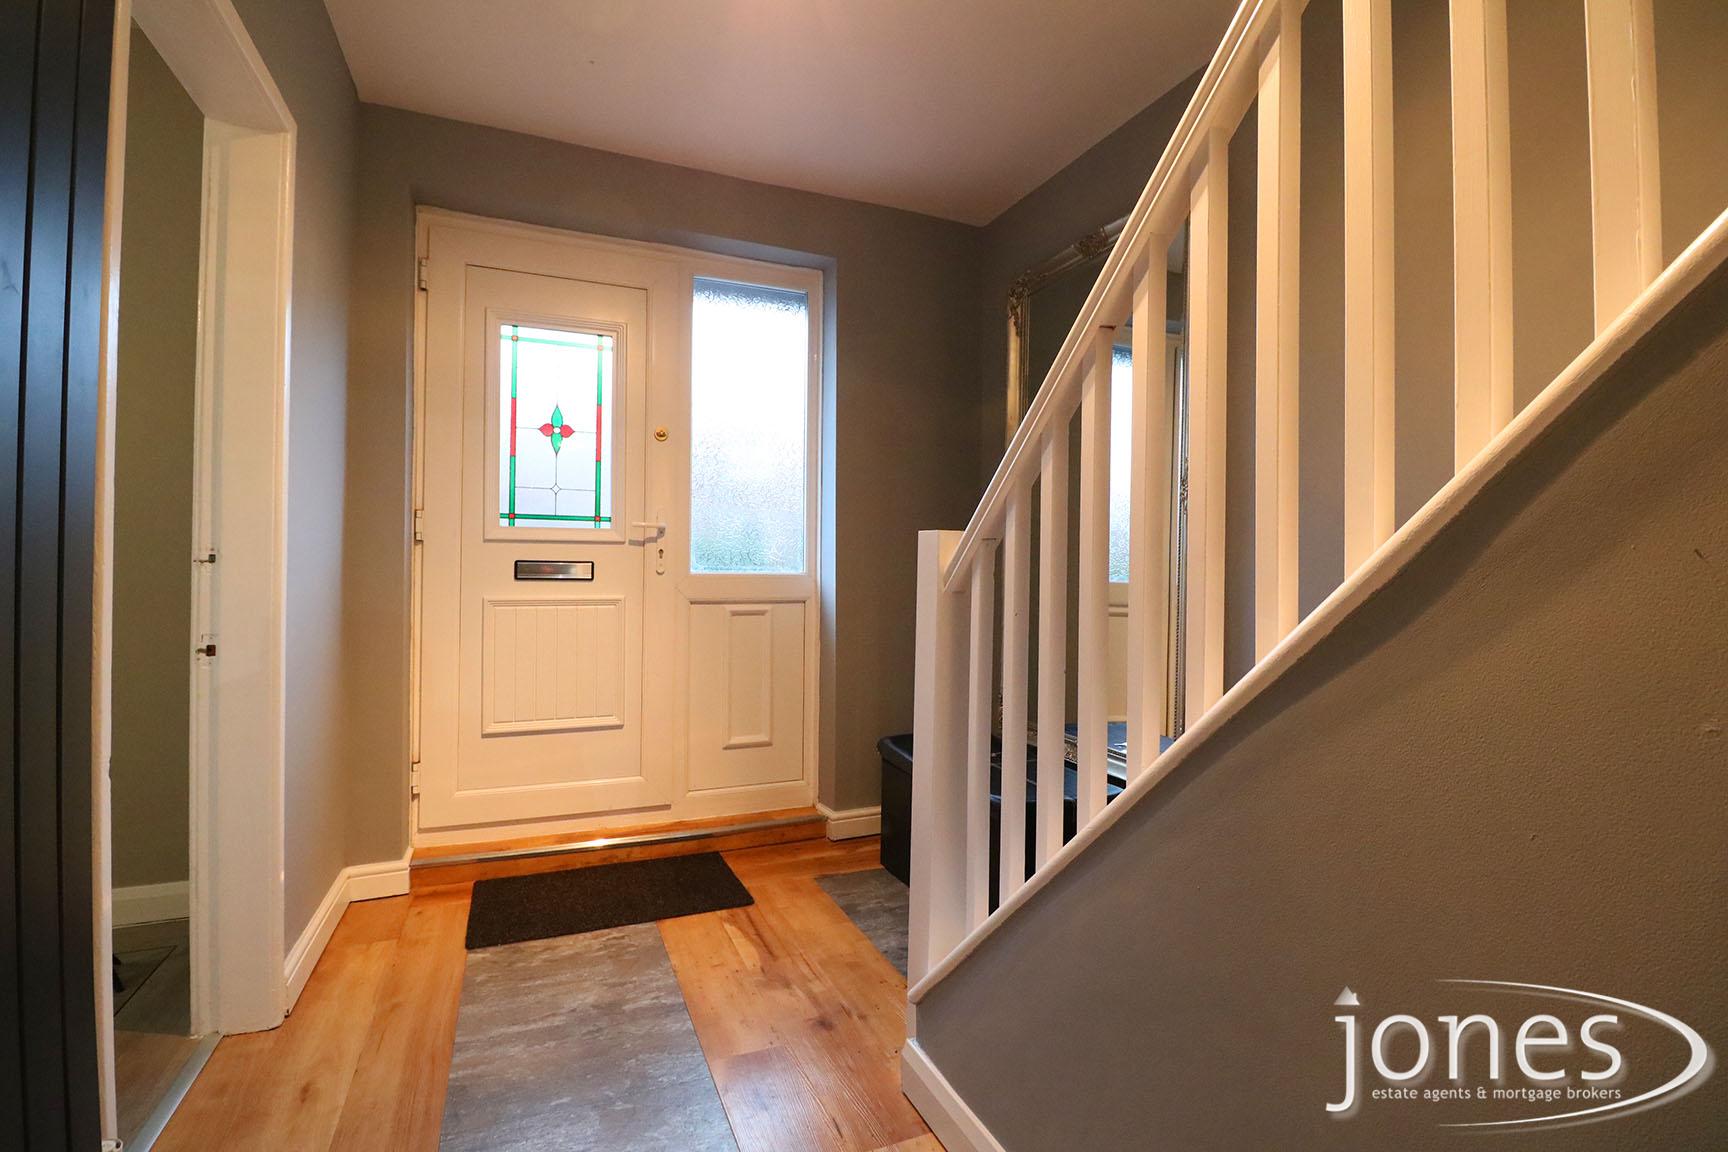 Home for Sale Let - Photo 06 Feetham Avenue, Darlington, DL1 2DY